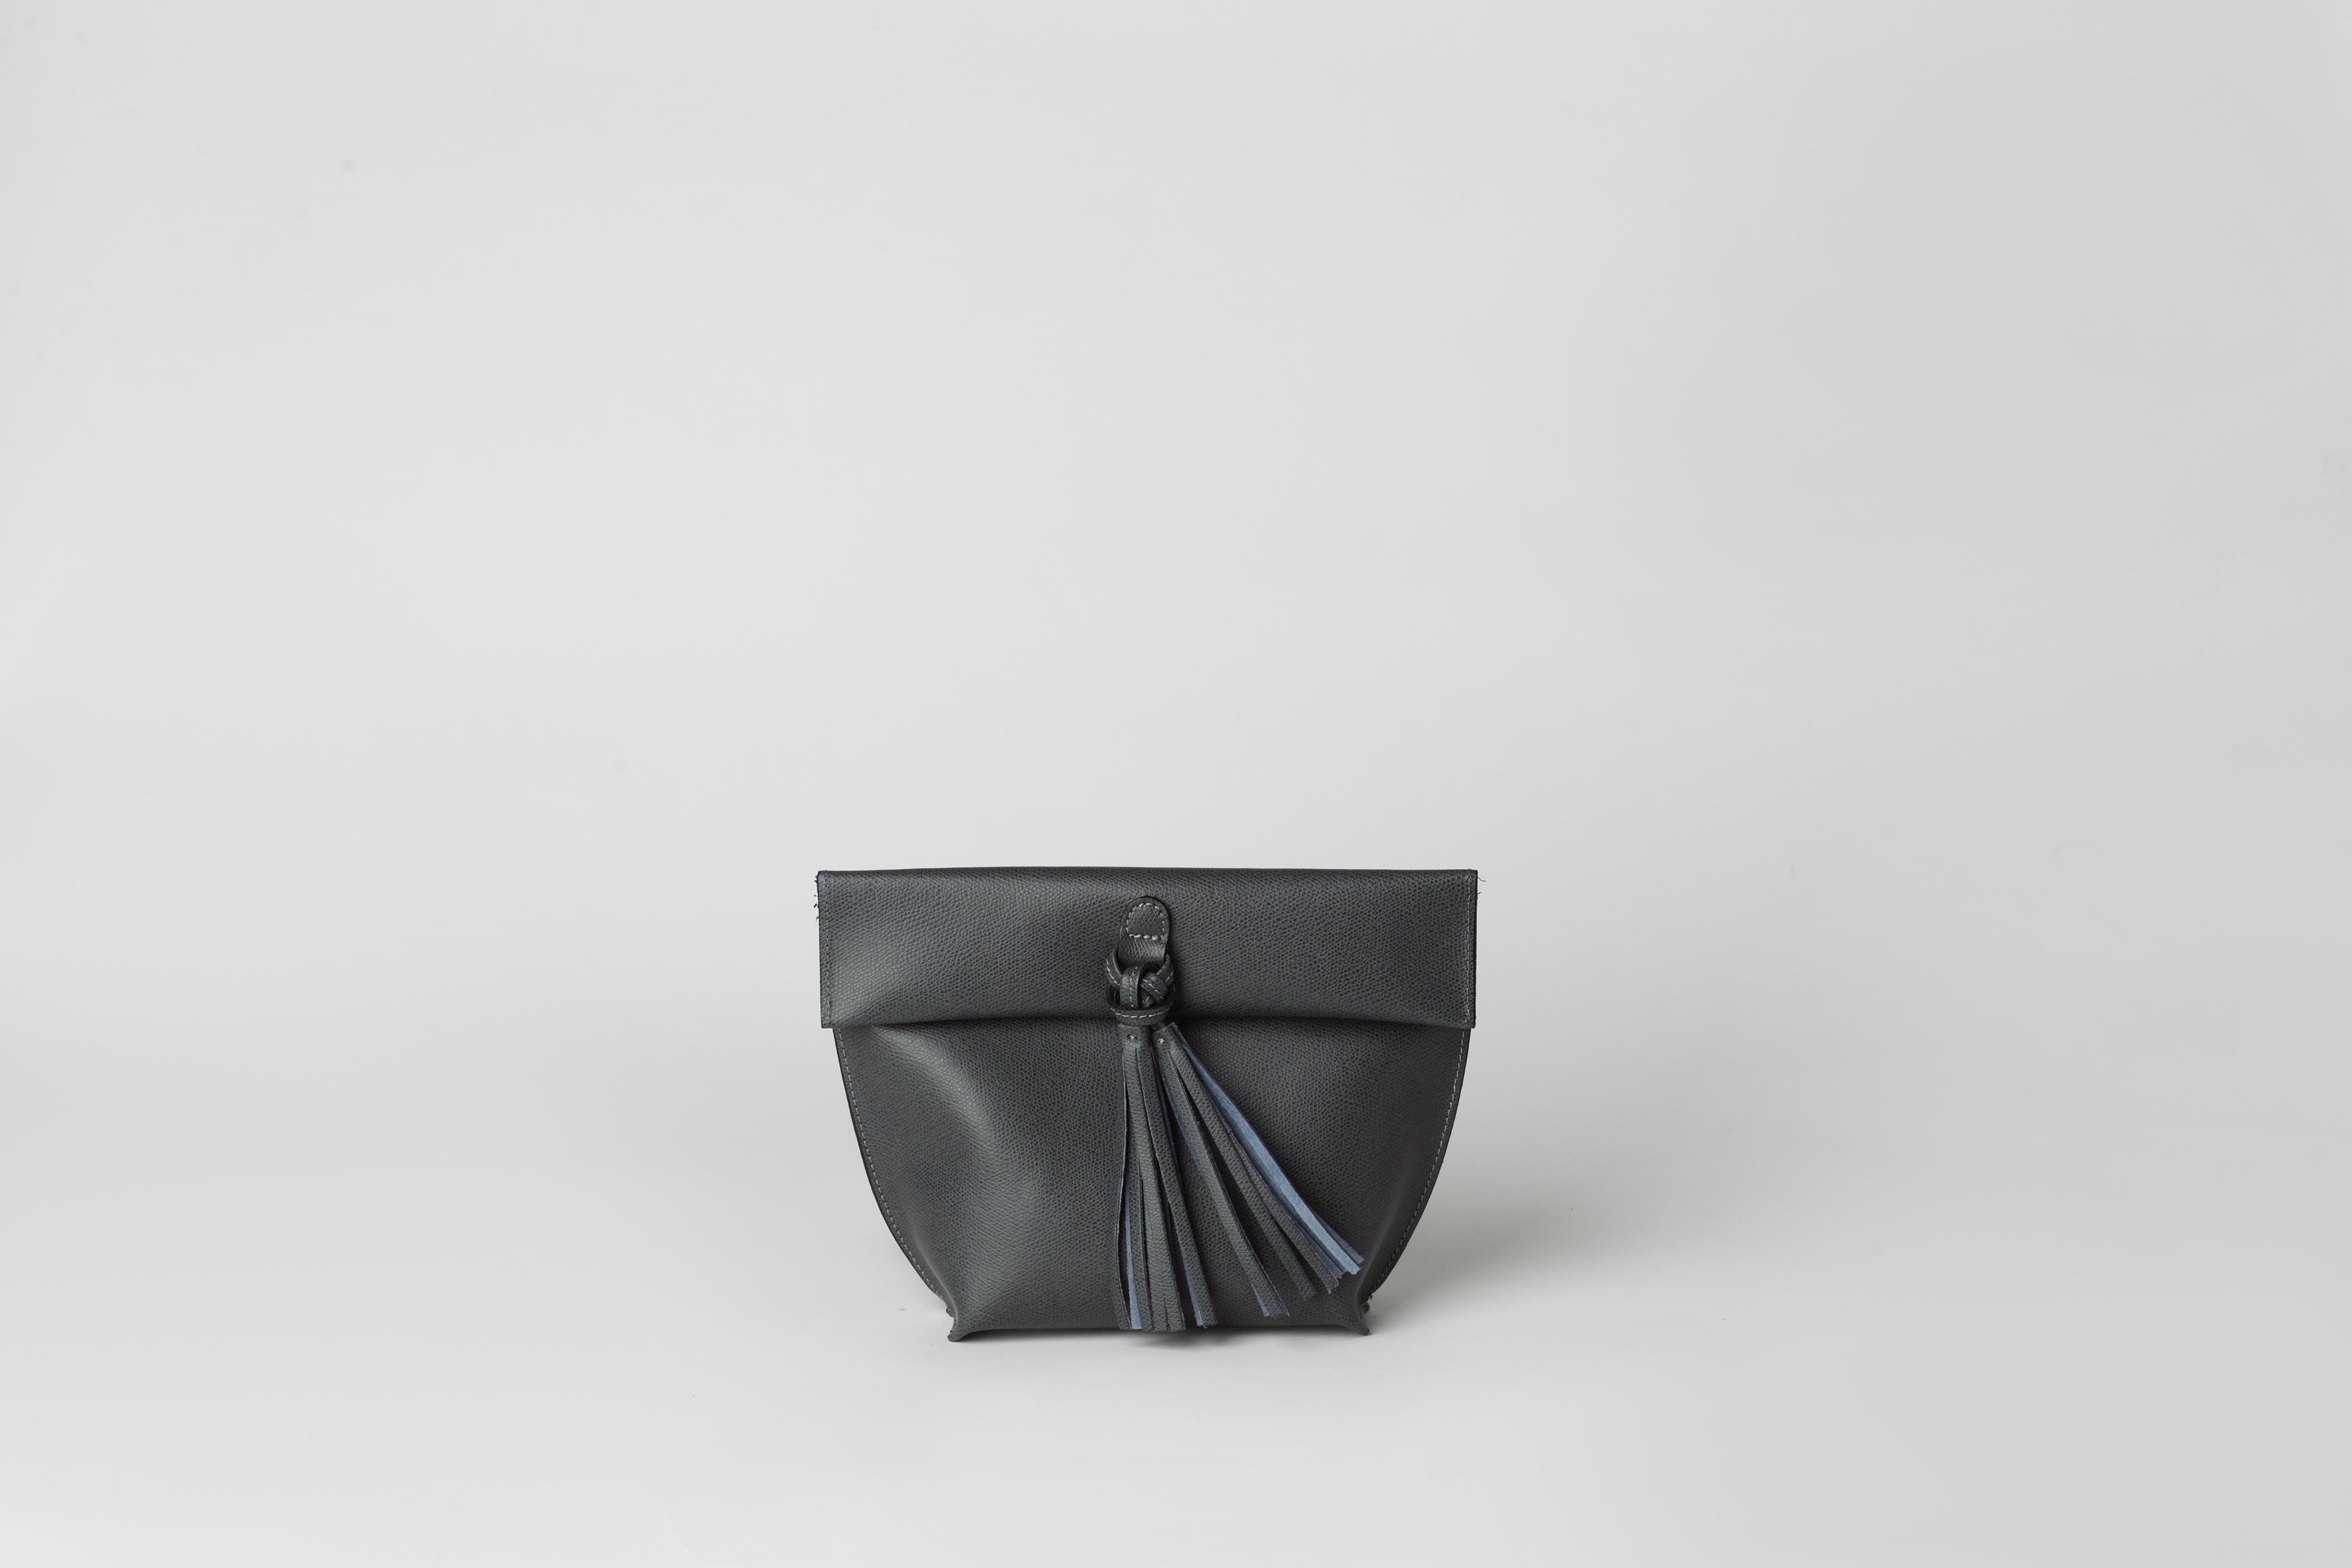 fdc69018827e Кожаная сумка через плечо - TAKUMI - crossbody bag real leather. В наличии  в Москве